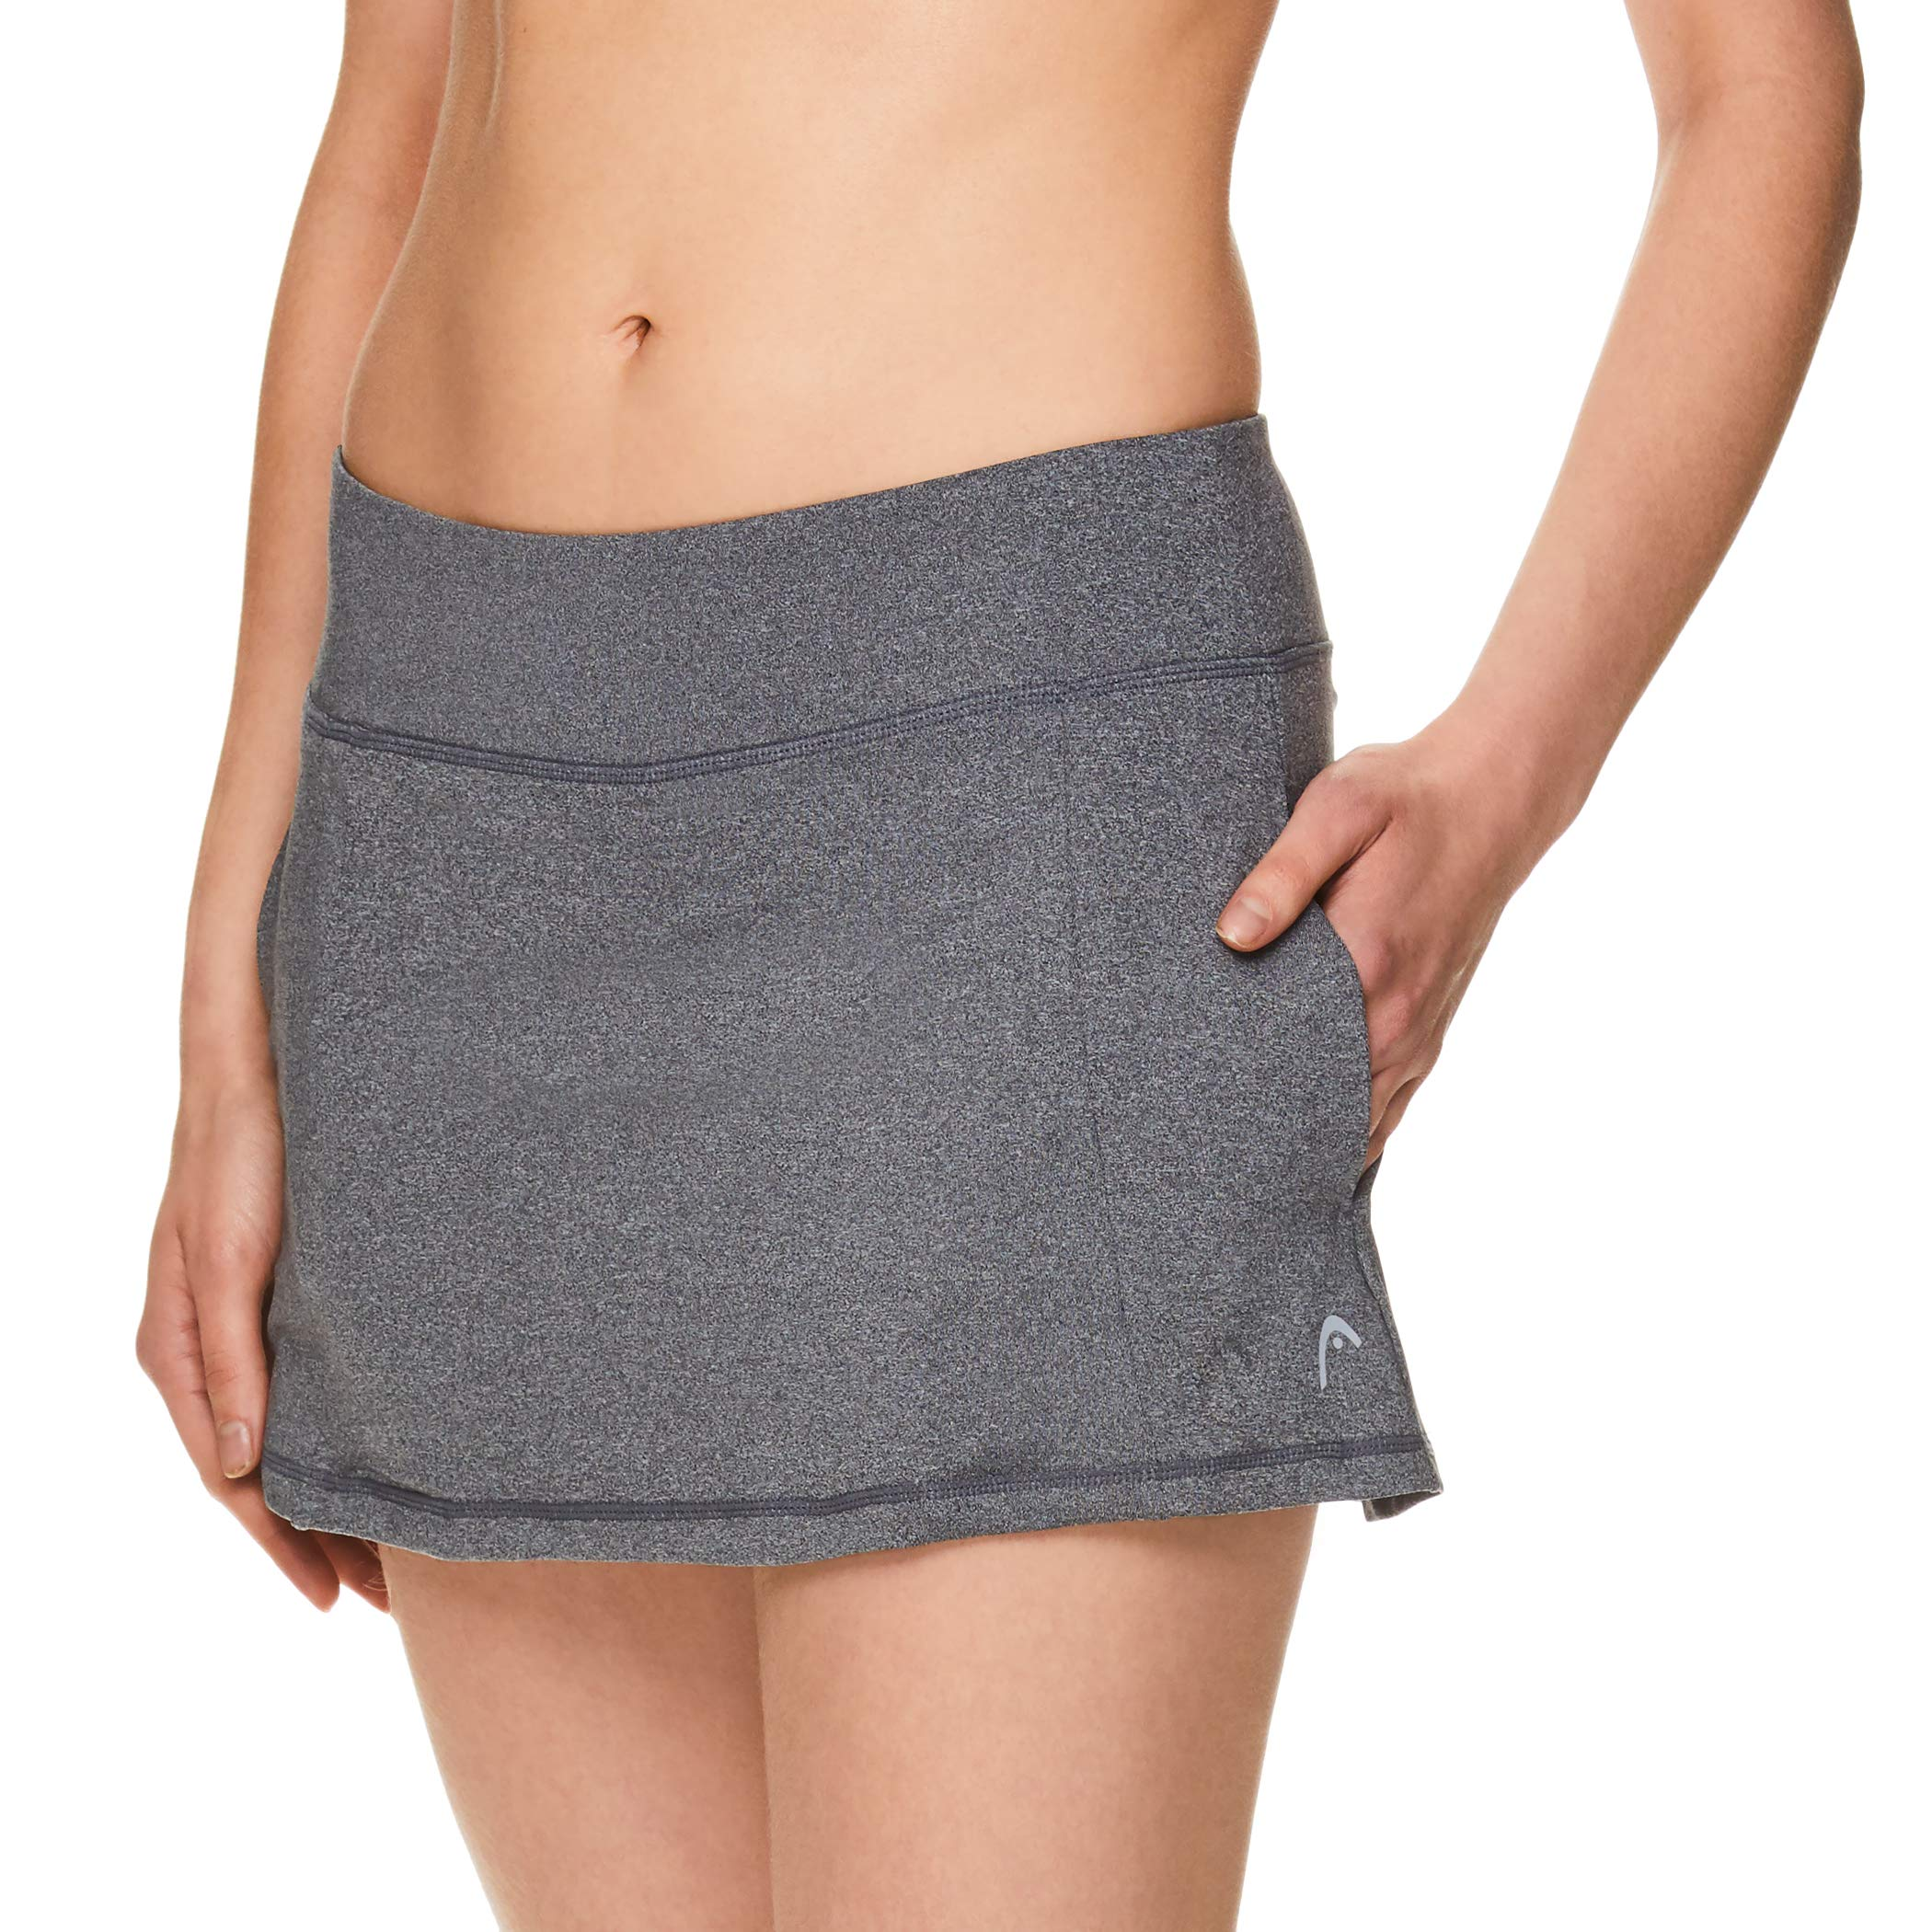 HEAD Women's Athletic Tennis Skort - Performance Training & Running Skirt - Lead Skort Charcoal, X-Small